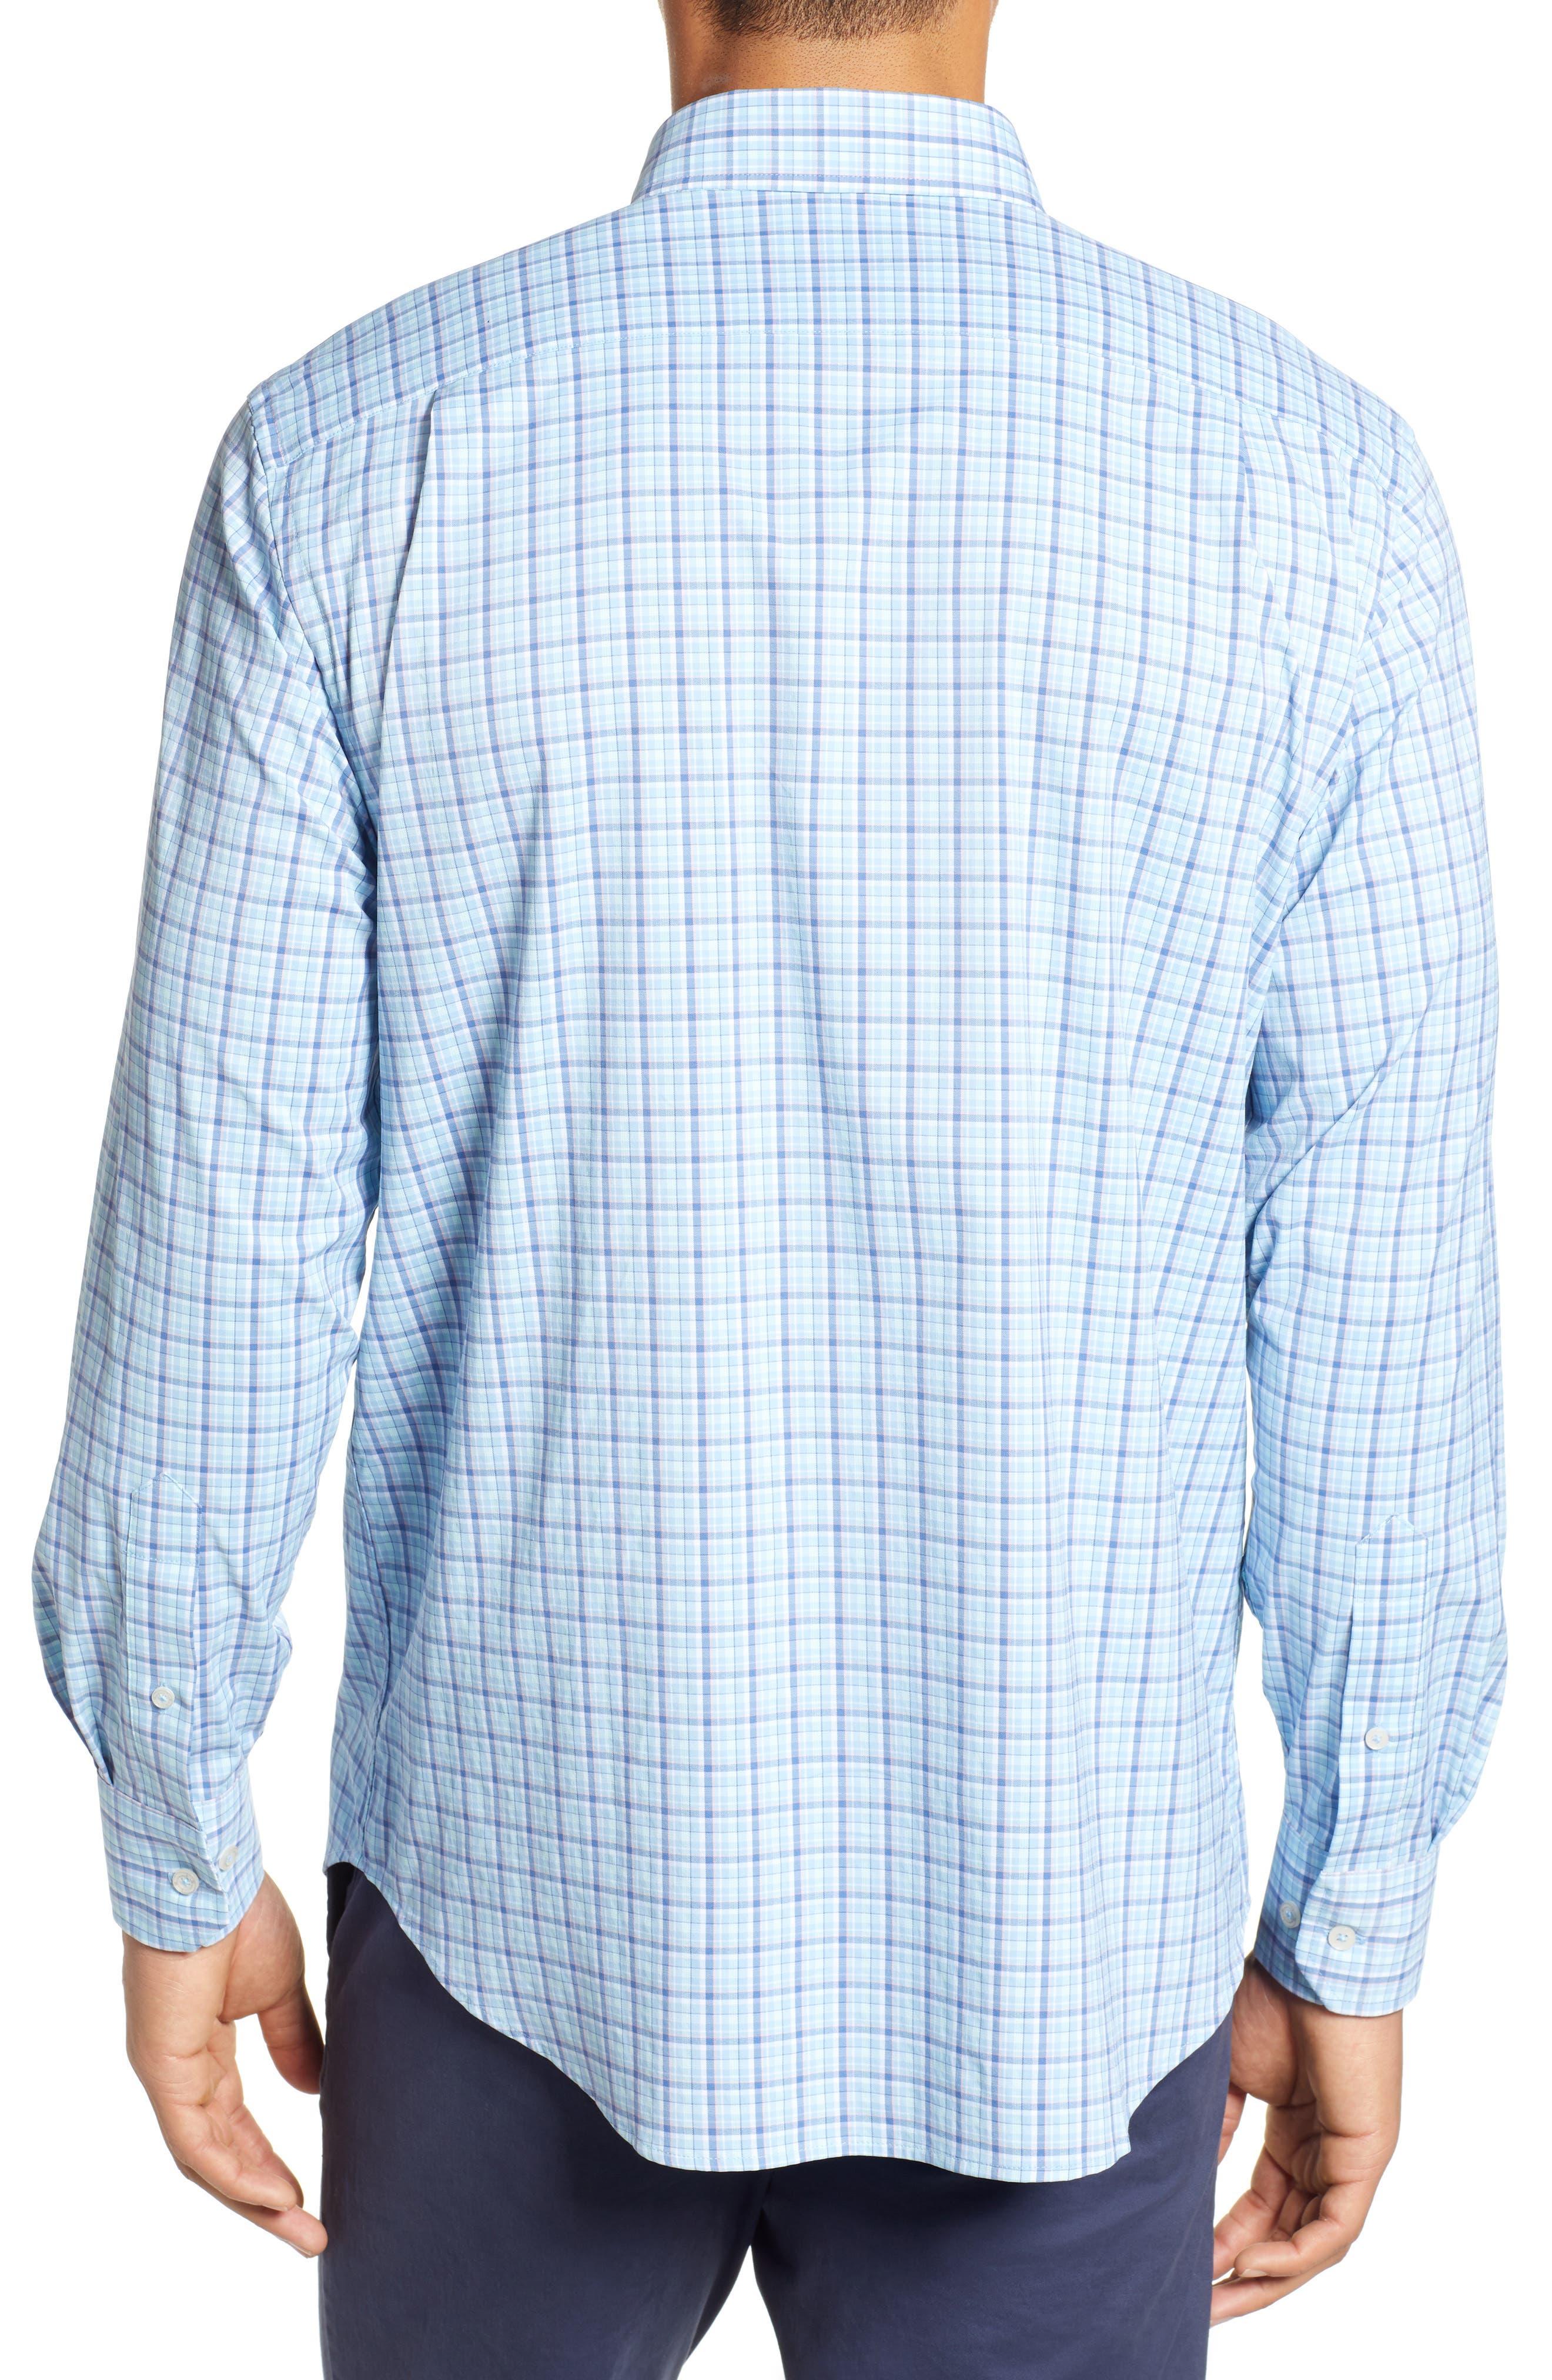 Staycation Intercoastal Regular Fit Plaid Performance Sport Shirt,                             Alternate thumbnail 3, color,                             SKY BLUE